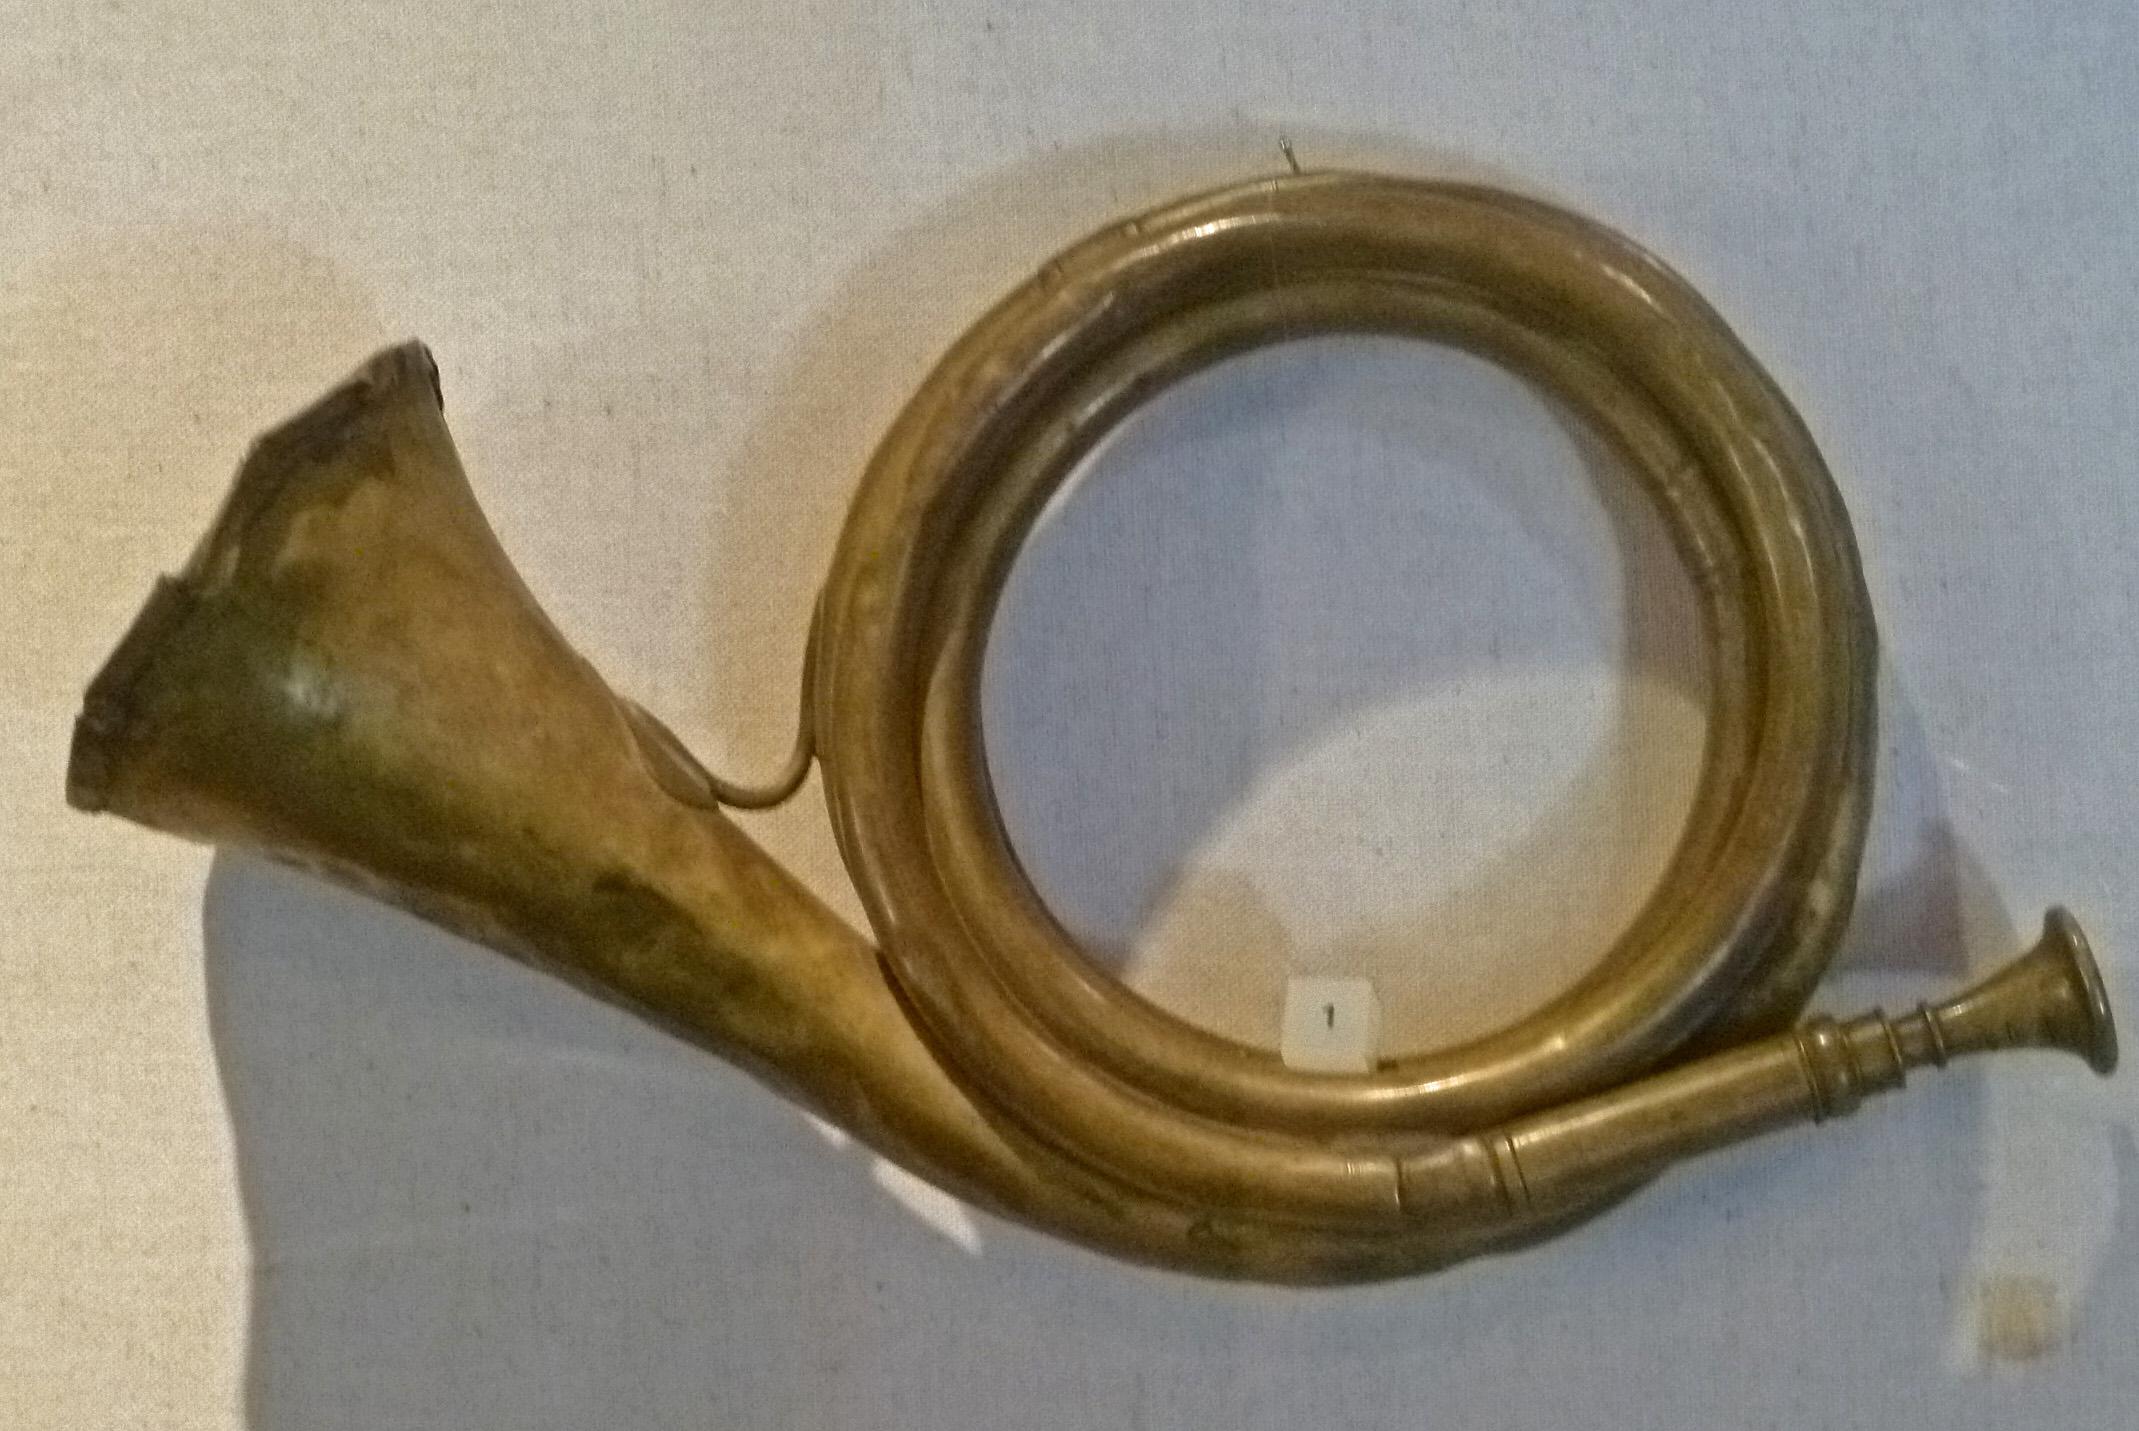 Post horn (19th century); exhibition in the Spandau citadel, Spandau, Germany. Photo taken on September 14, 2011.